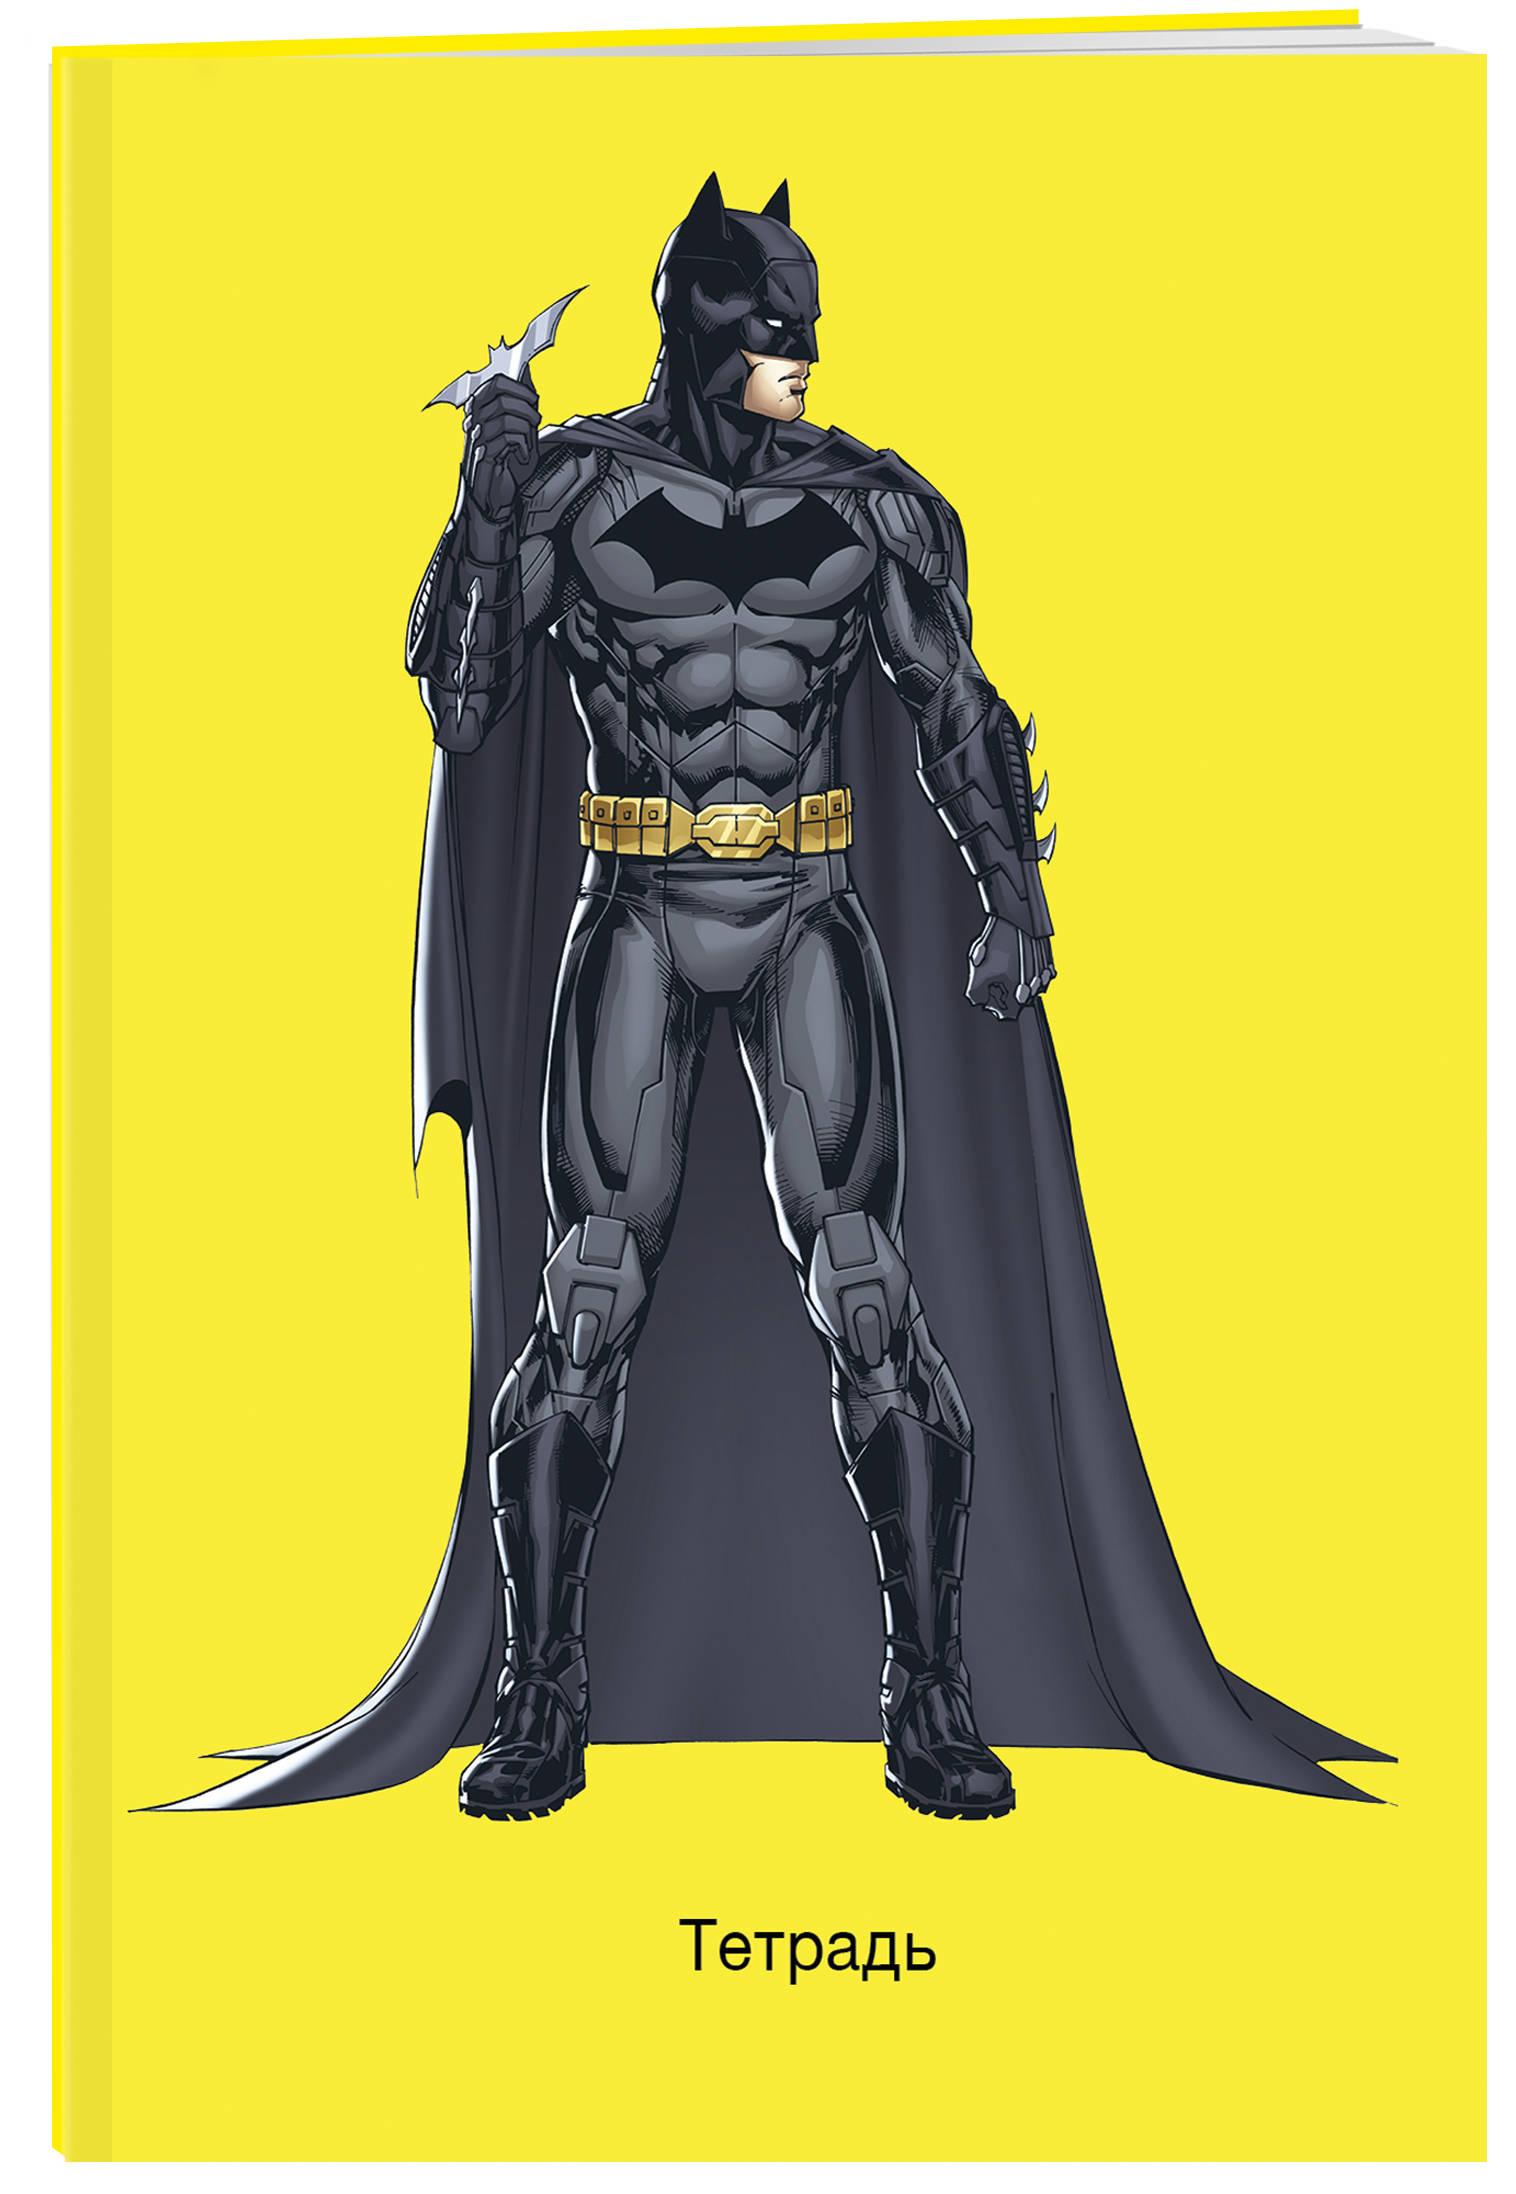 Бэтмен. Тетрадь (А5, 48 л., УФ-лак, накидки, желтая)